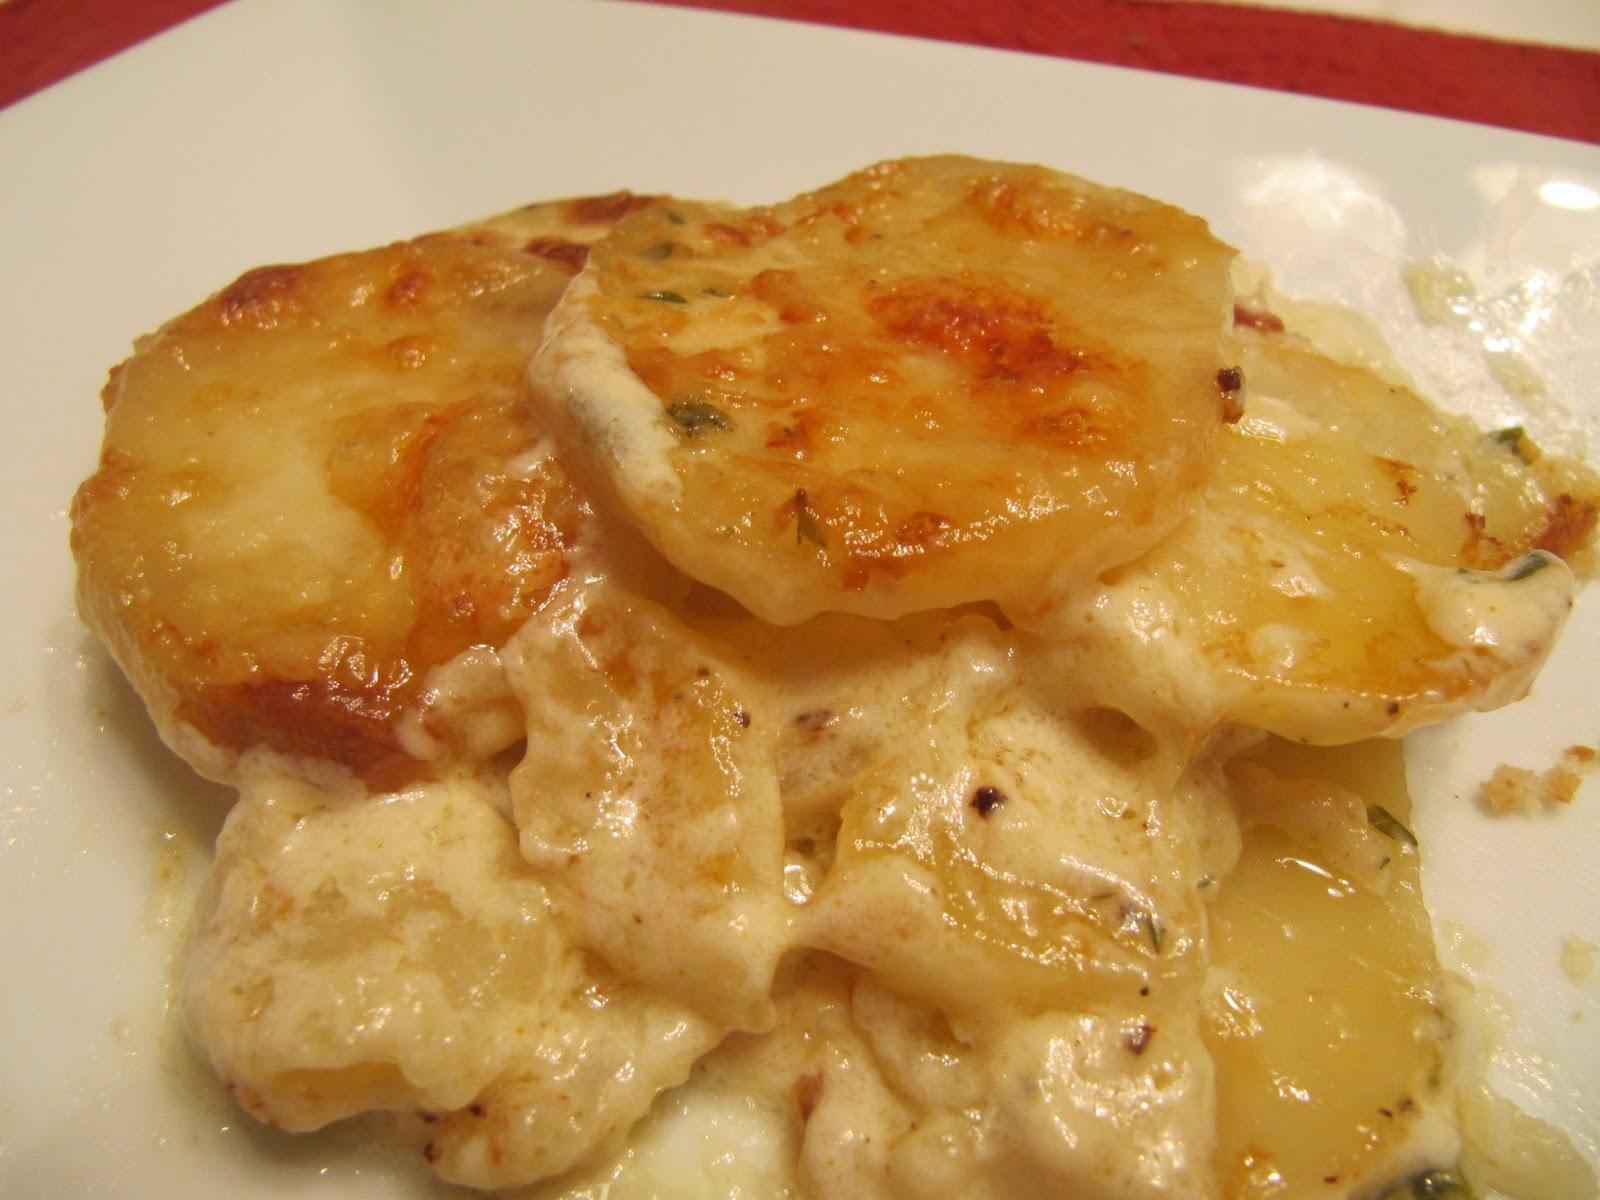 Cookin' in Anne's Kitchen: Anne's Potatoes au Gratin